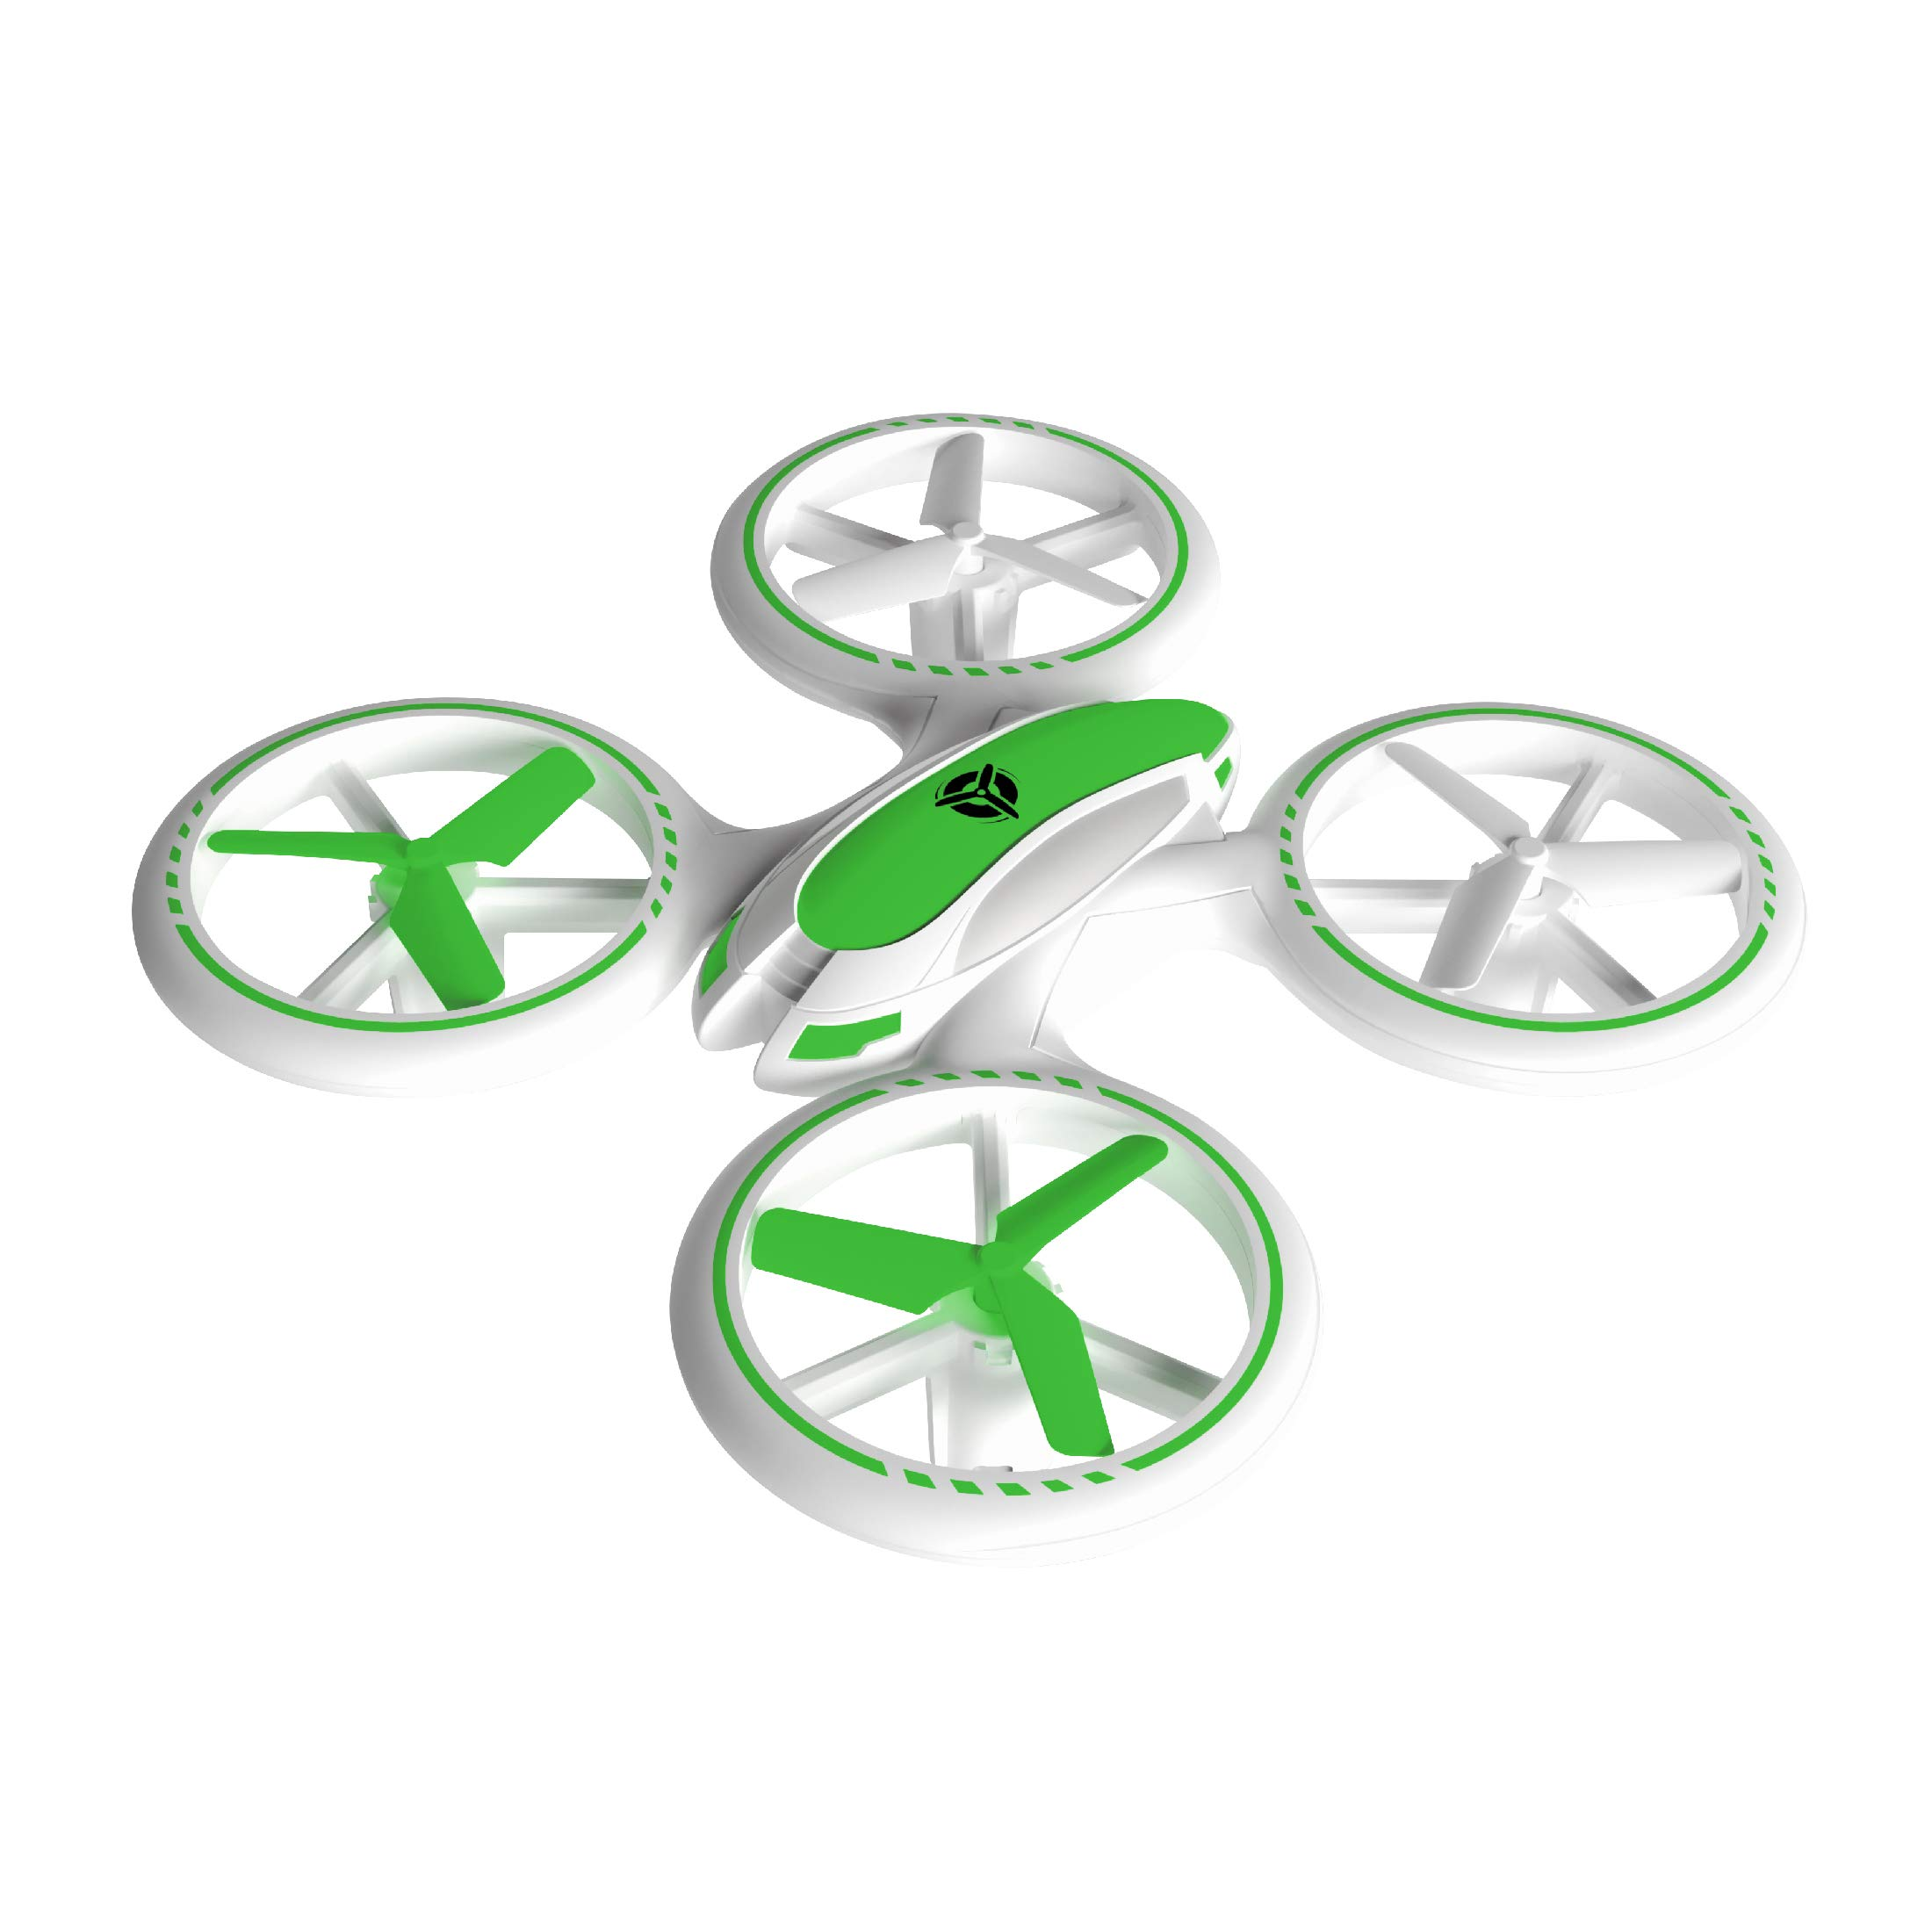 mini ufo drone instructions